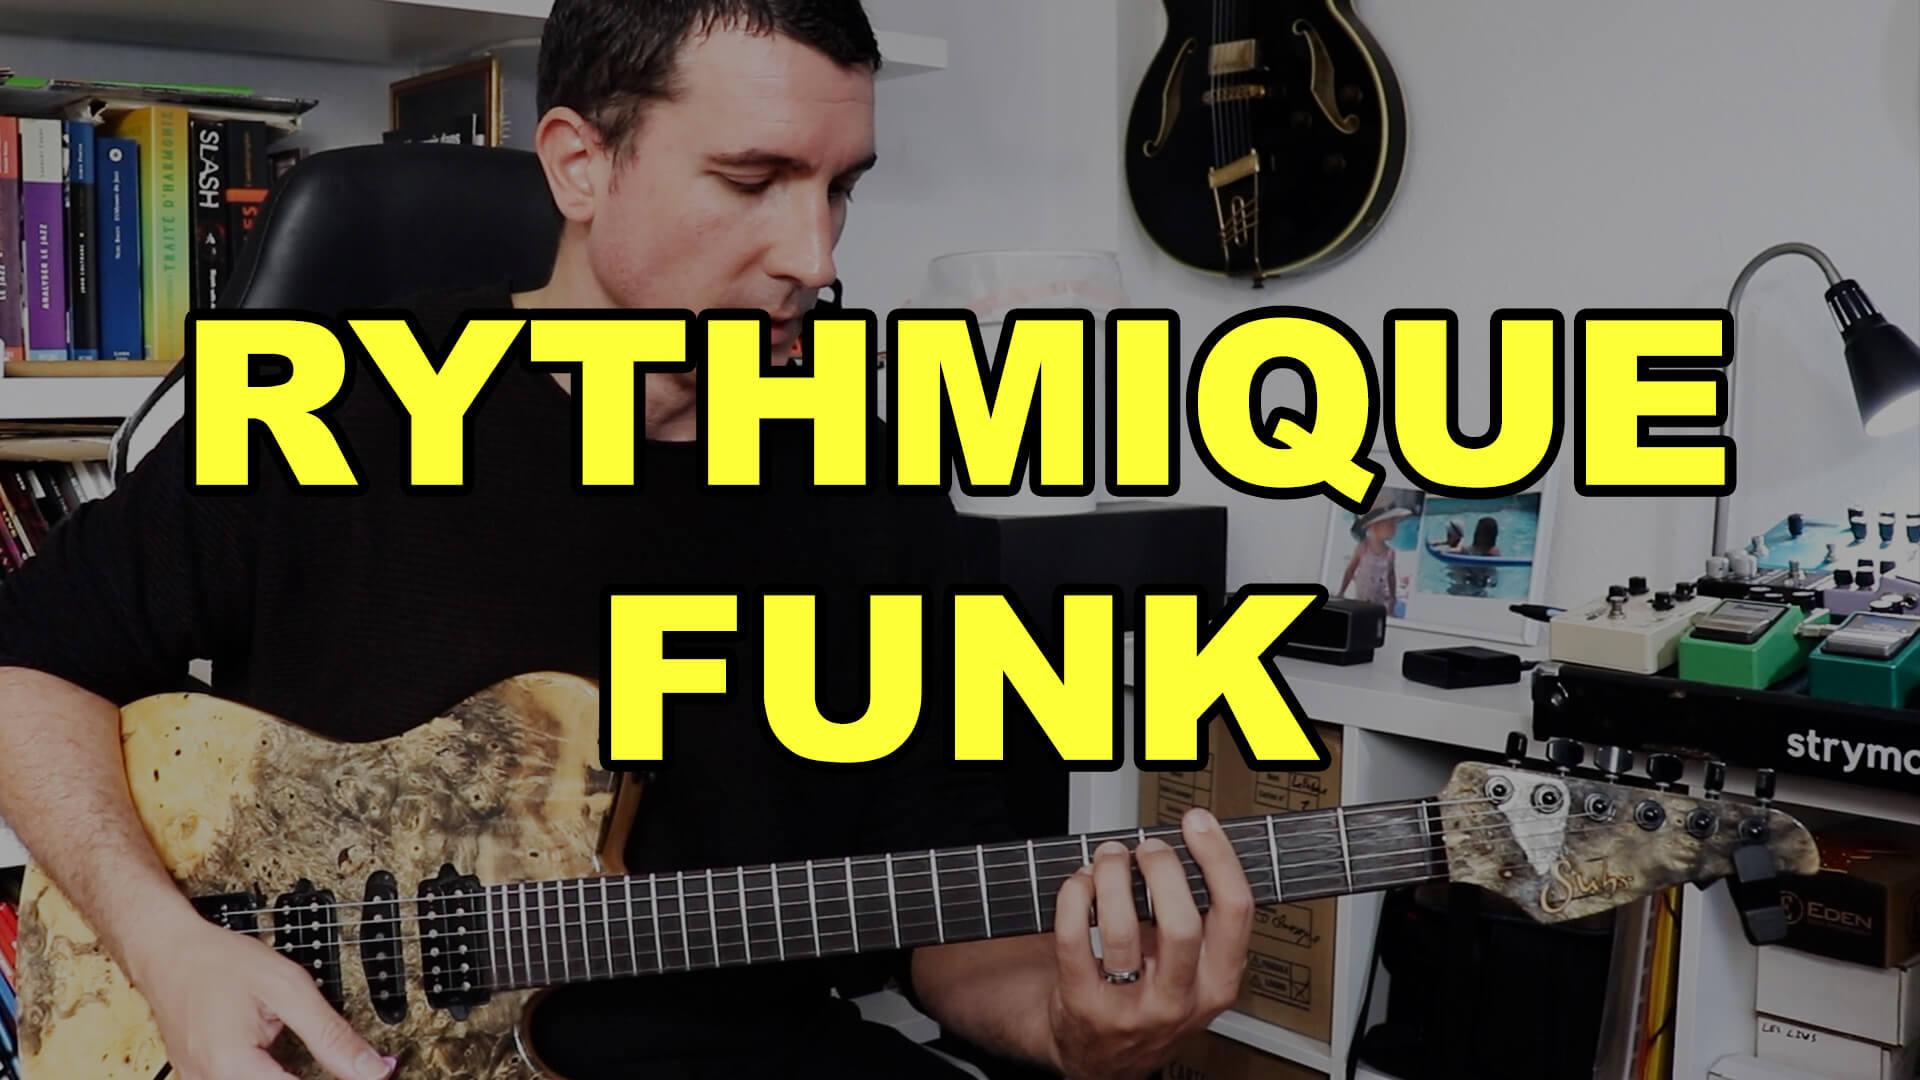 Rythmique funk 1